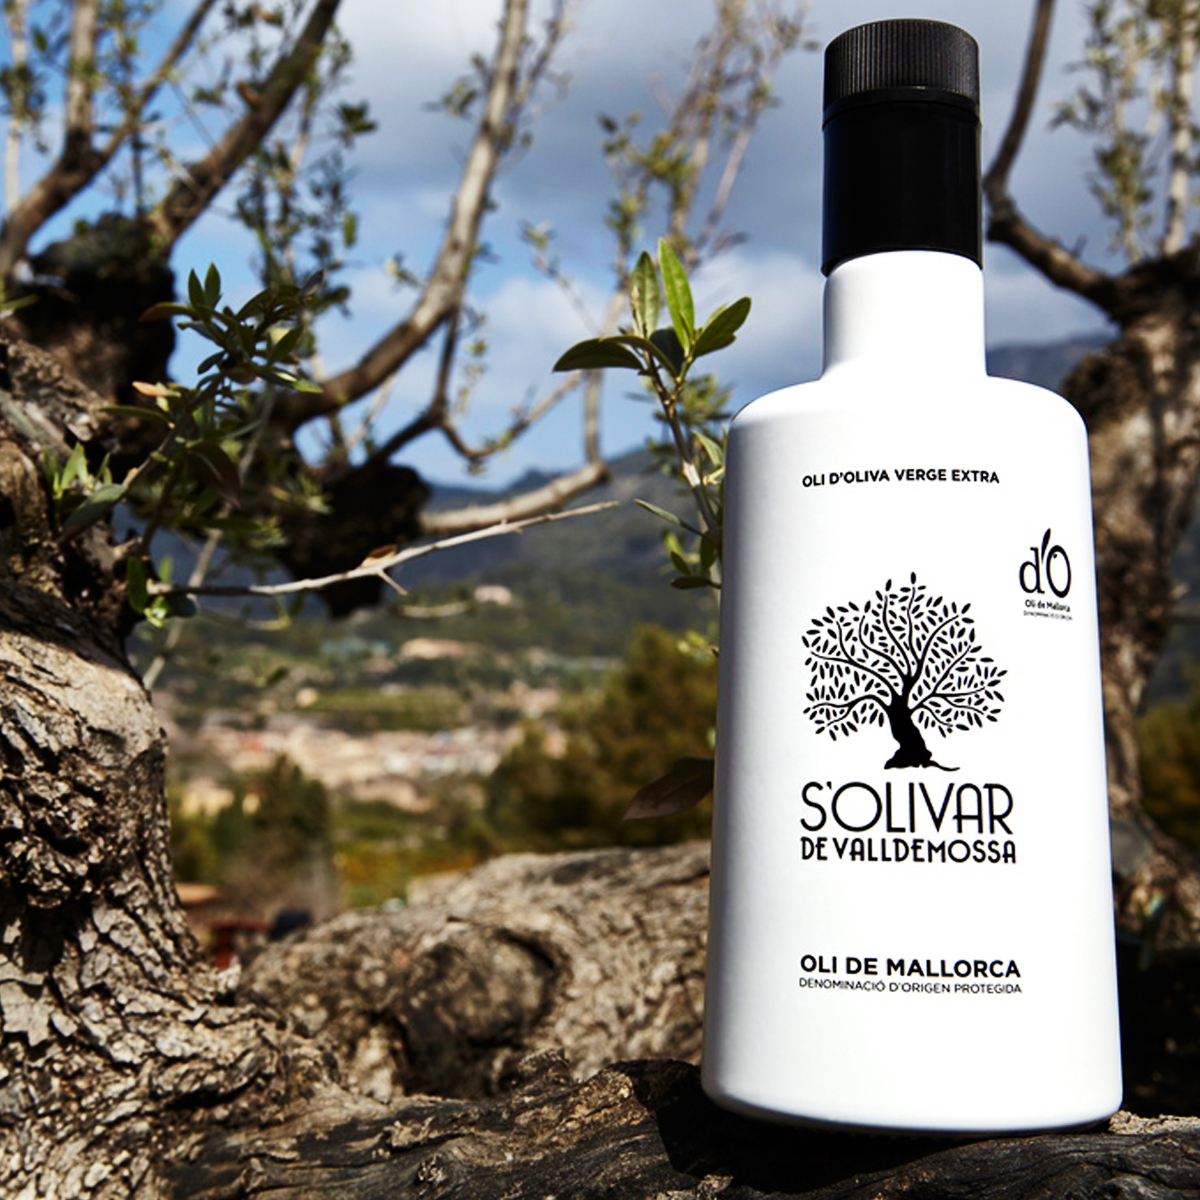 Extra Virgin Olive Oil Oli s'Olivar de Valldemossa